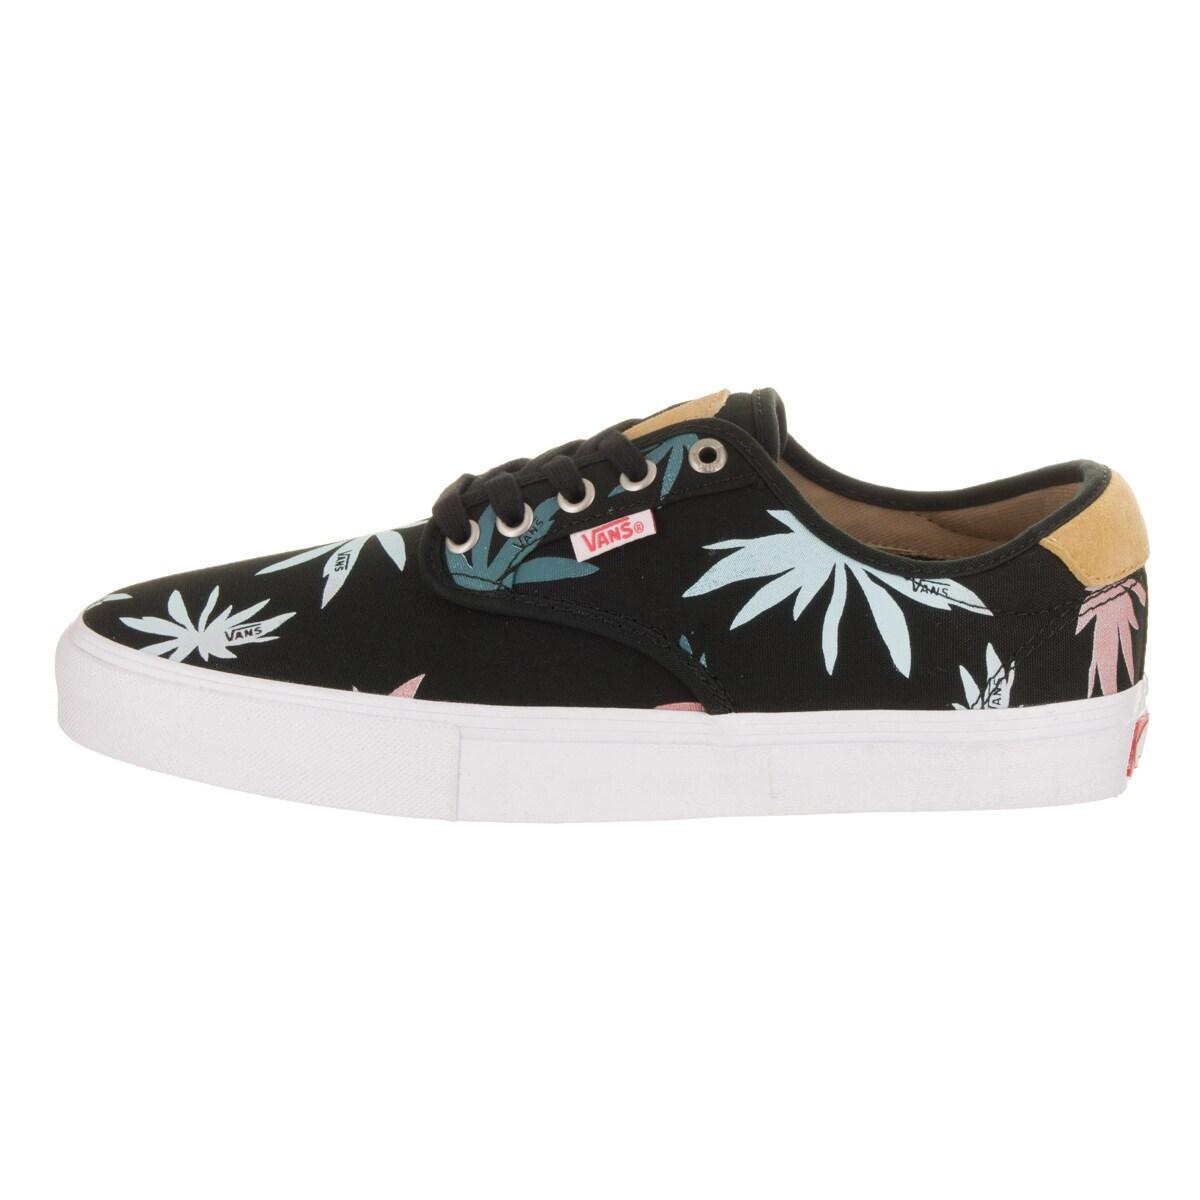 79507dfdd2472f Shop Vans Men s Chima Ferguson Pro Palm Fade Black Canvas Skate Shoes -  Free Shipping Today - Overstock - 15054315